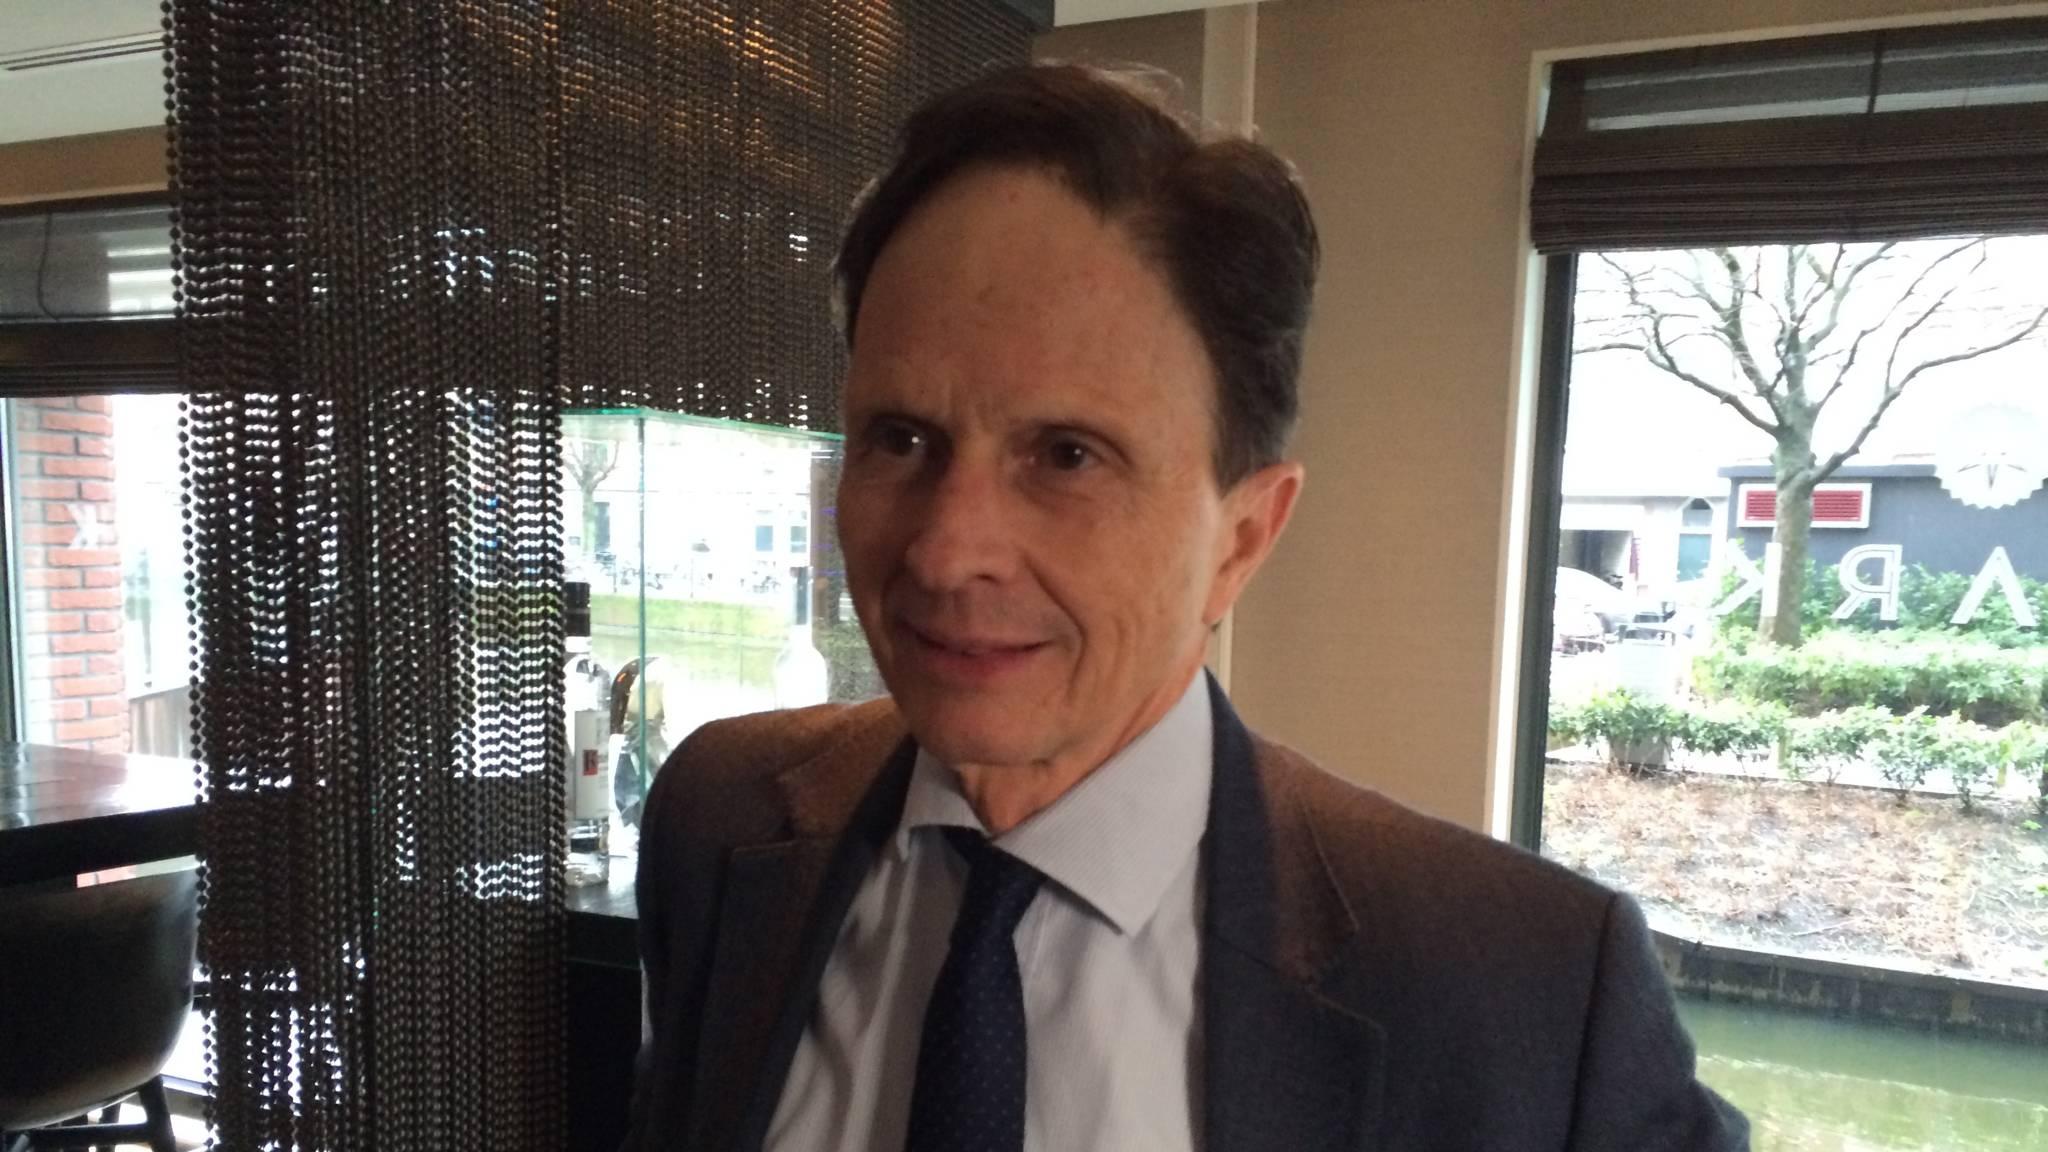 da4c13a9a41 Zika-expert en WHO-adviseur David Heymann NOS/Rinke van den Brink. '